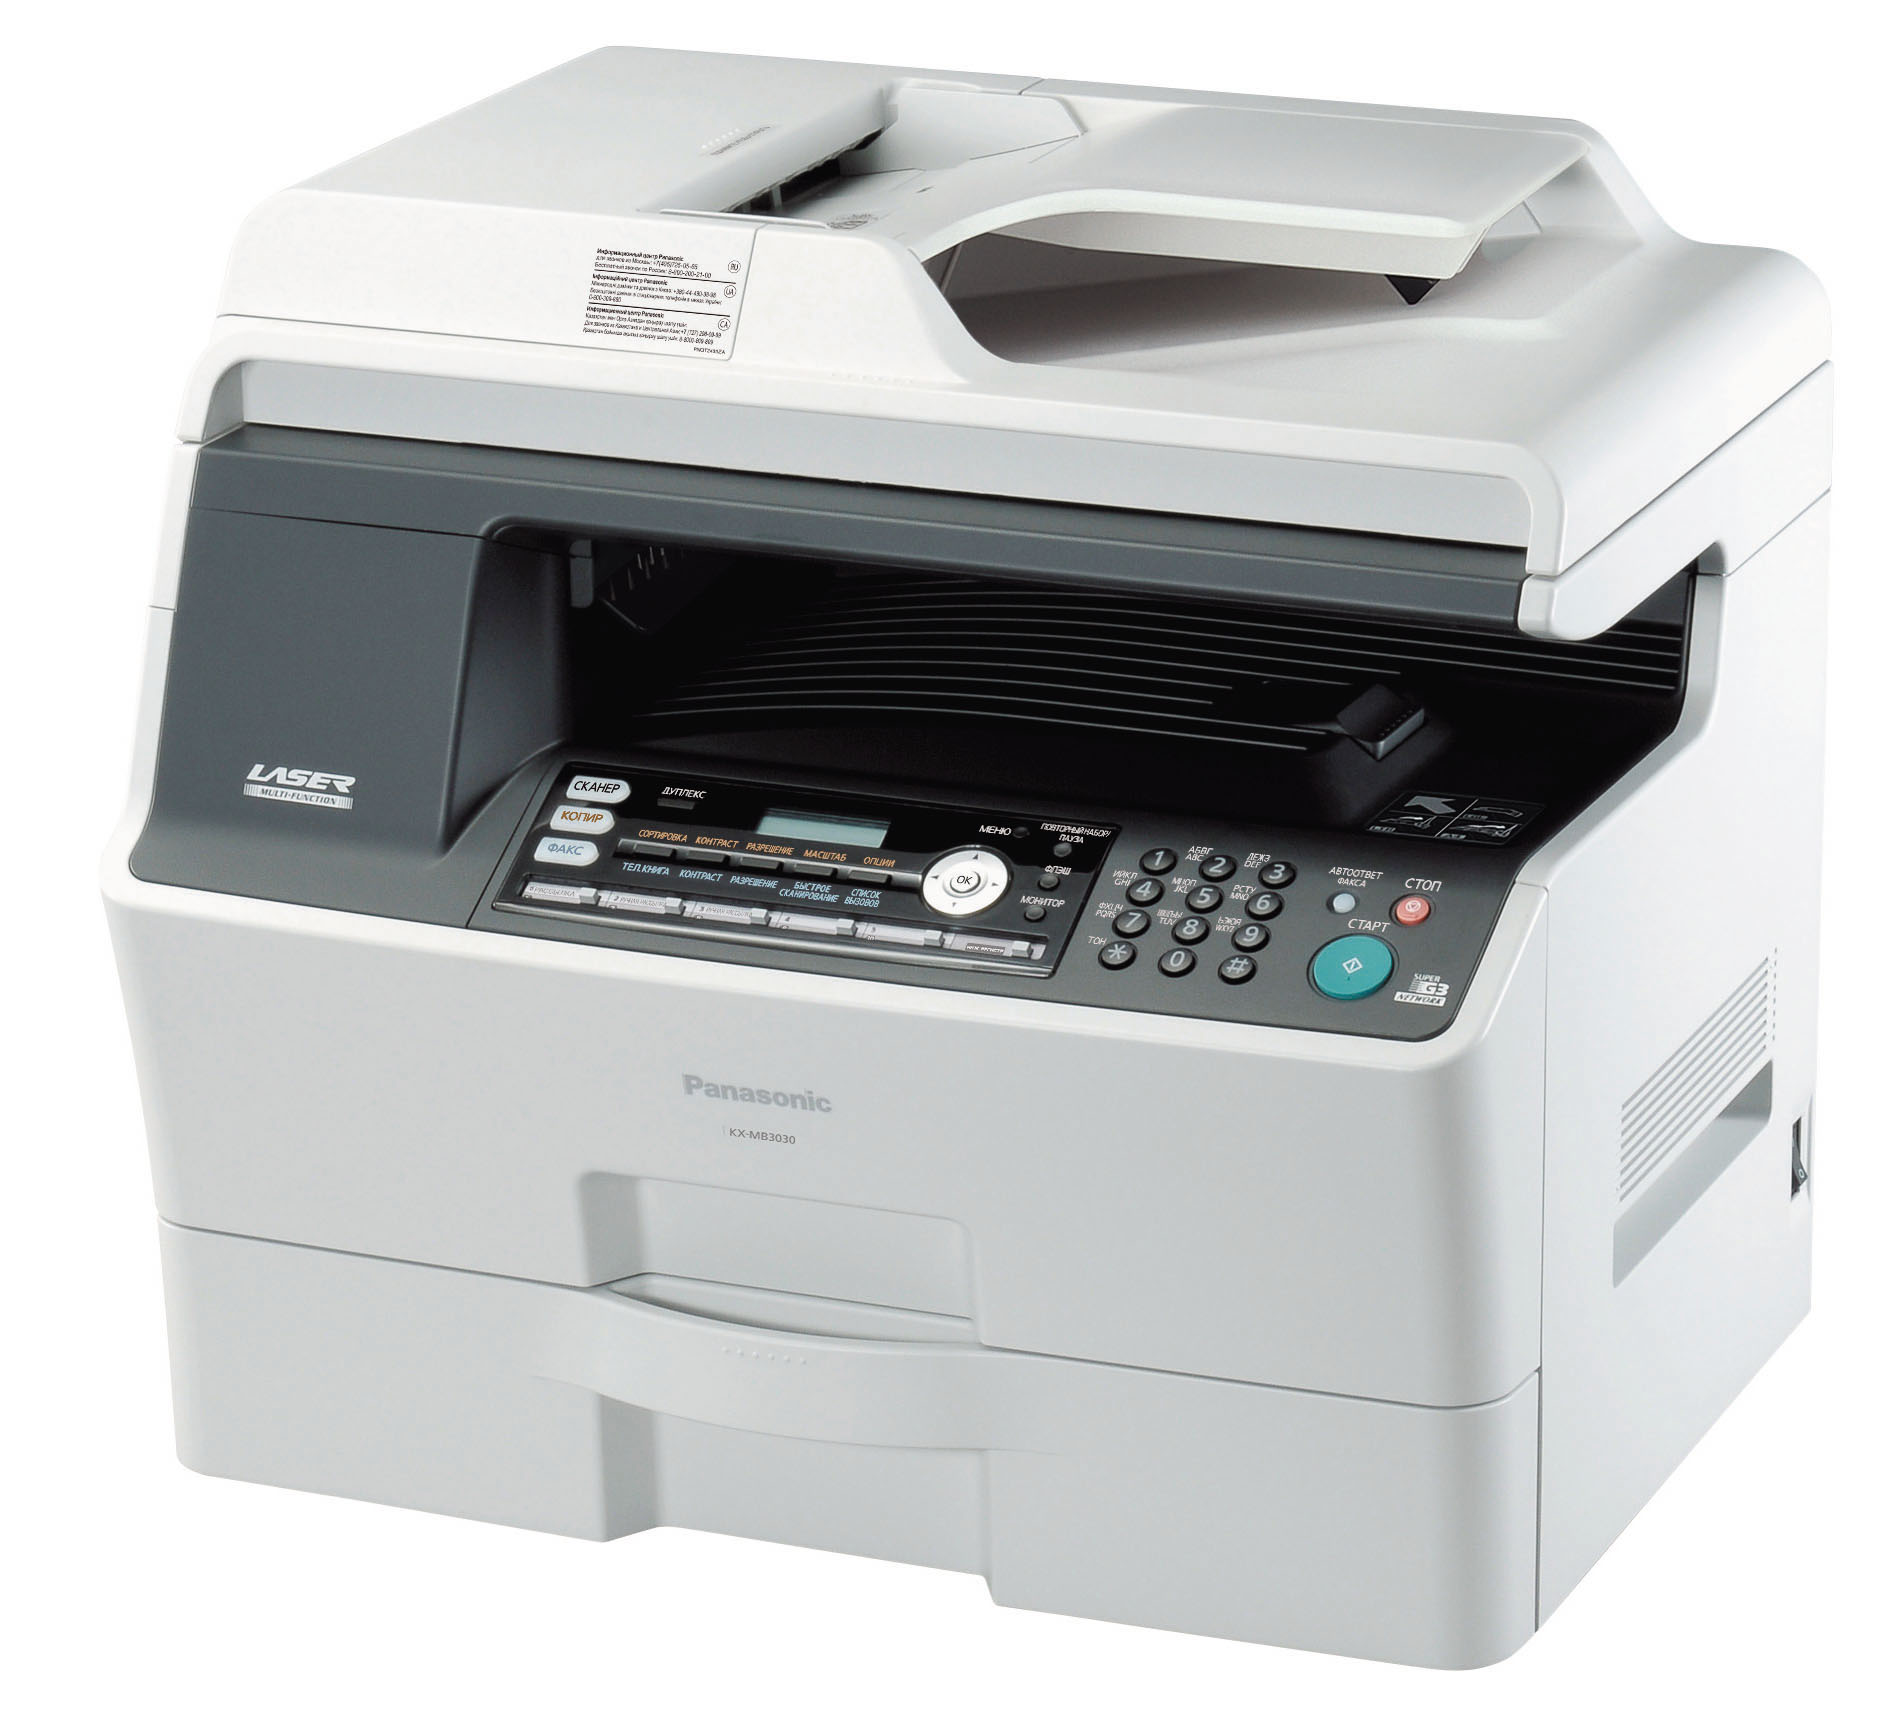 Ремонт принтера Panasonic KX-MB3030